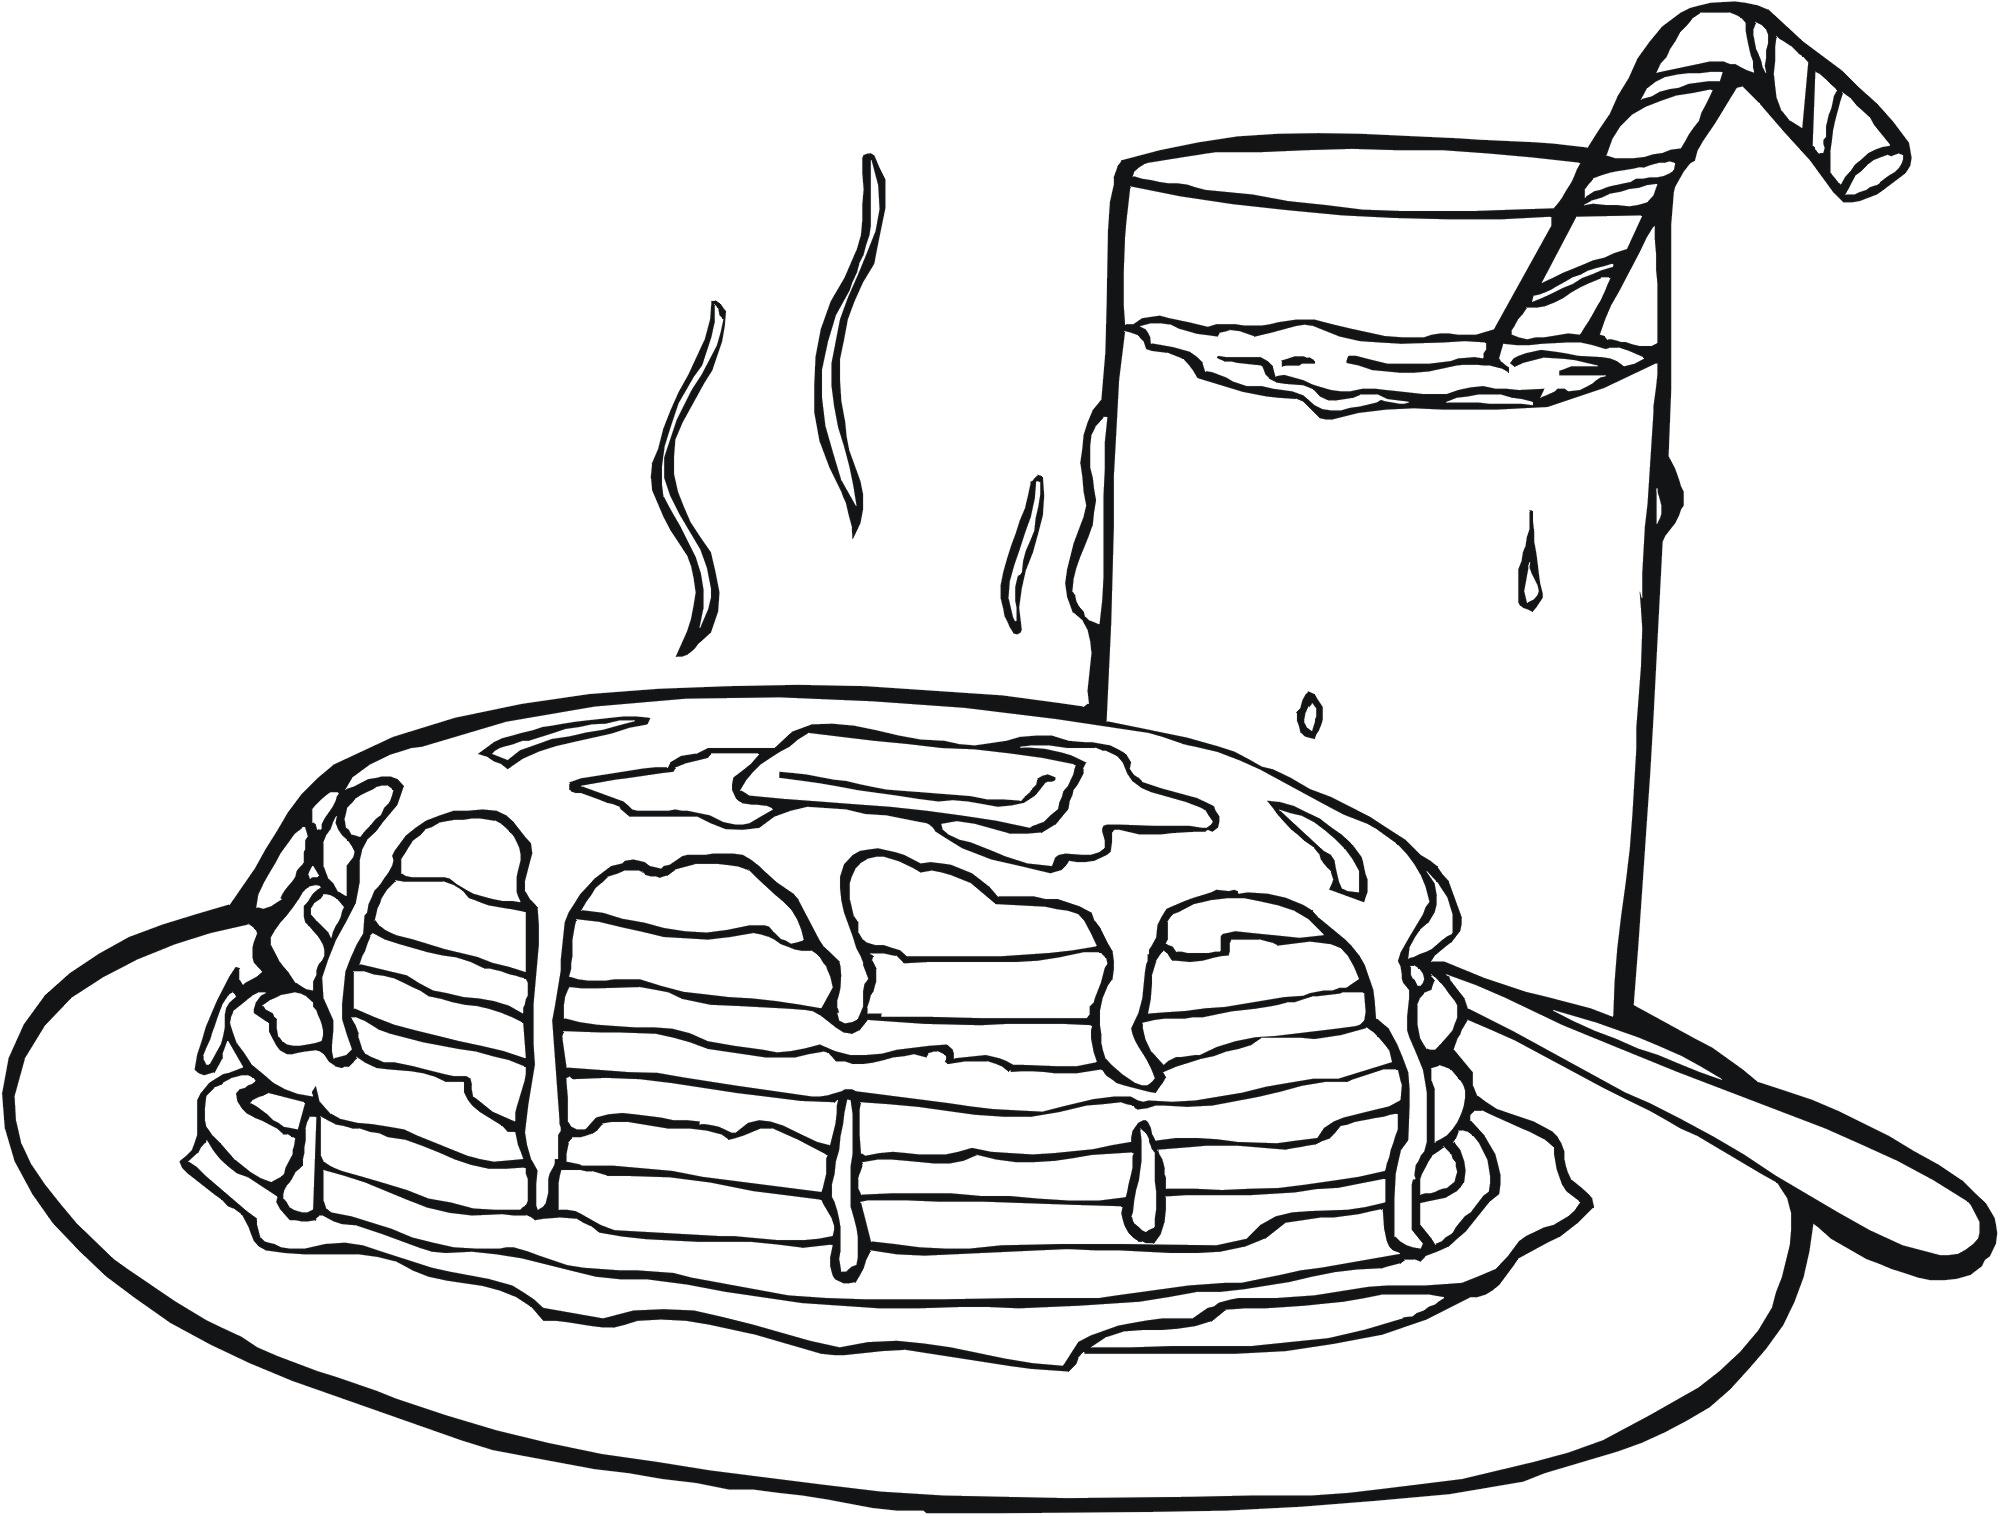 2000x1516 Food Coloring Pages Children's Best Activities